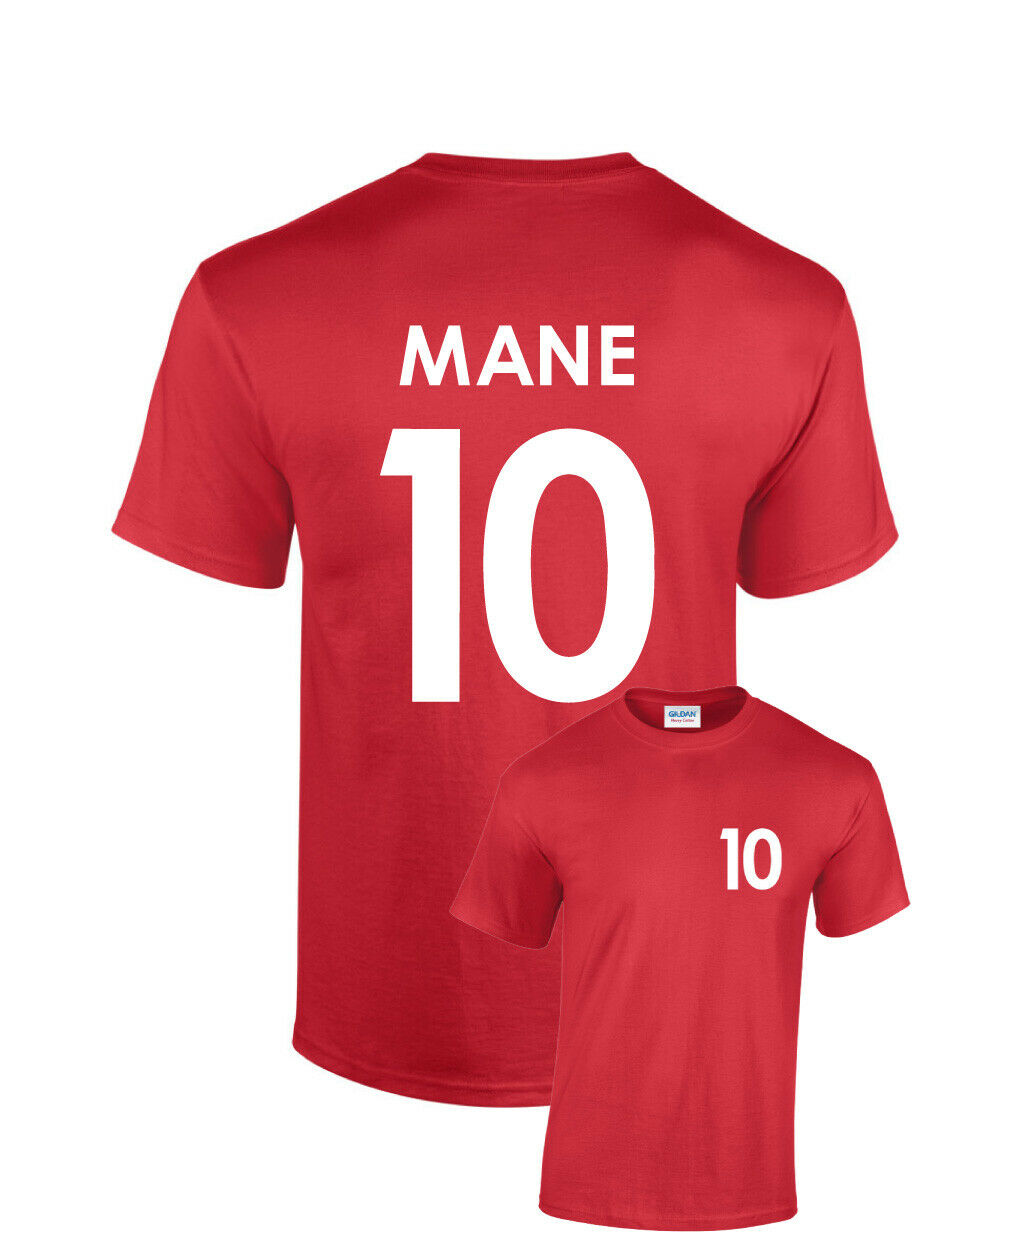 Sadio Mane Liverpool Fan Premium Men/'s T-Shirt